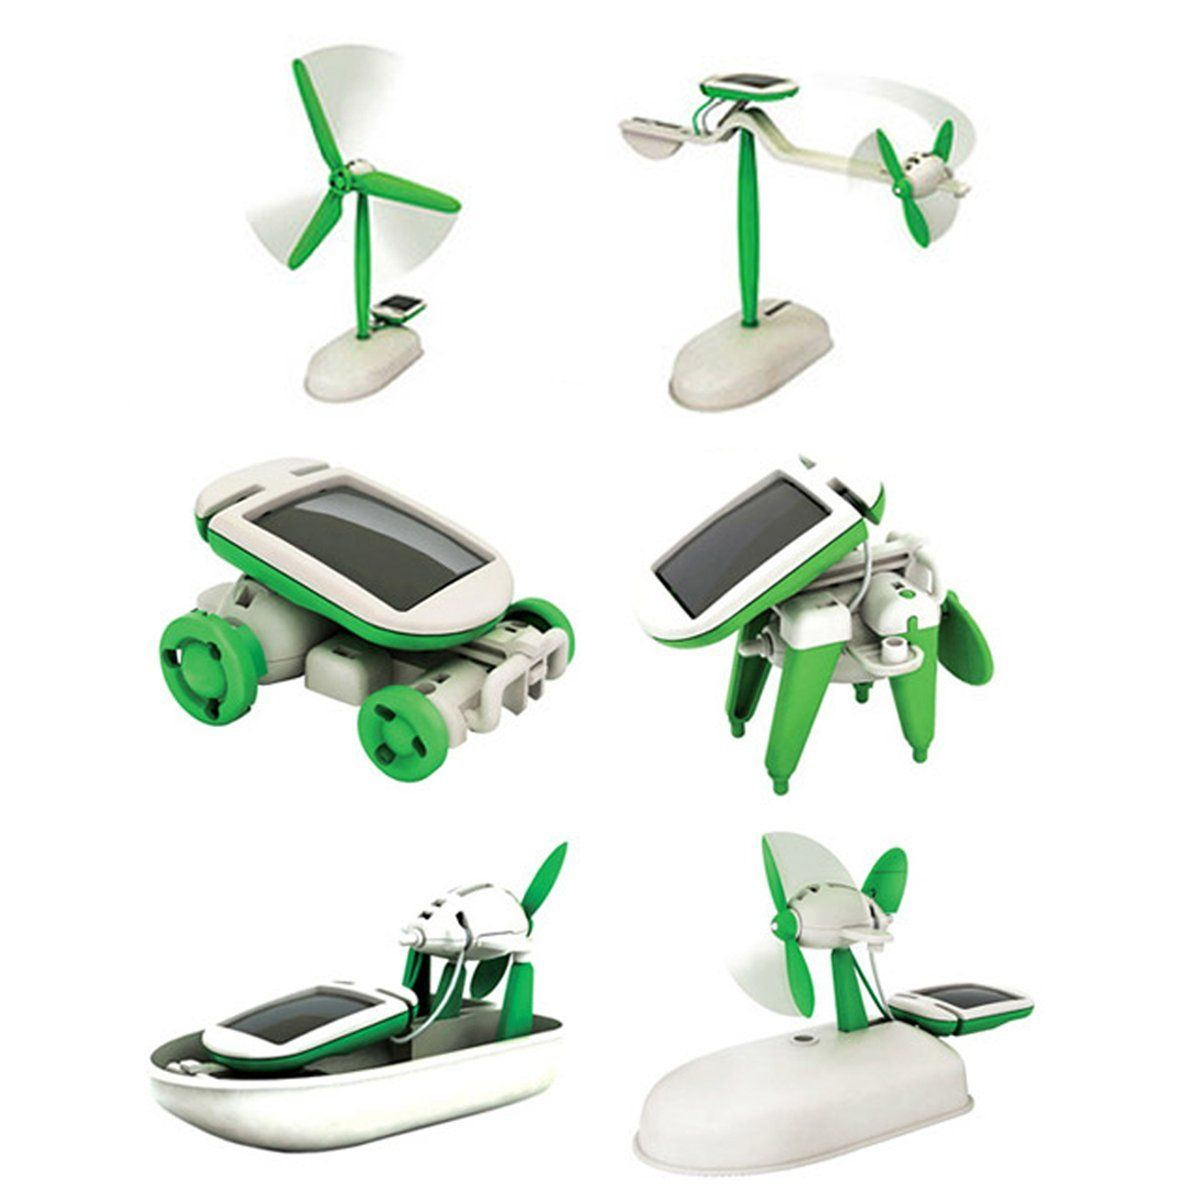 Solar robot kit | Robot kits, Robot kits for kids, Gifts